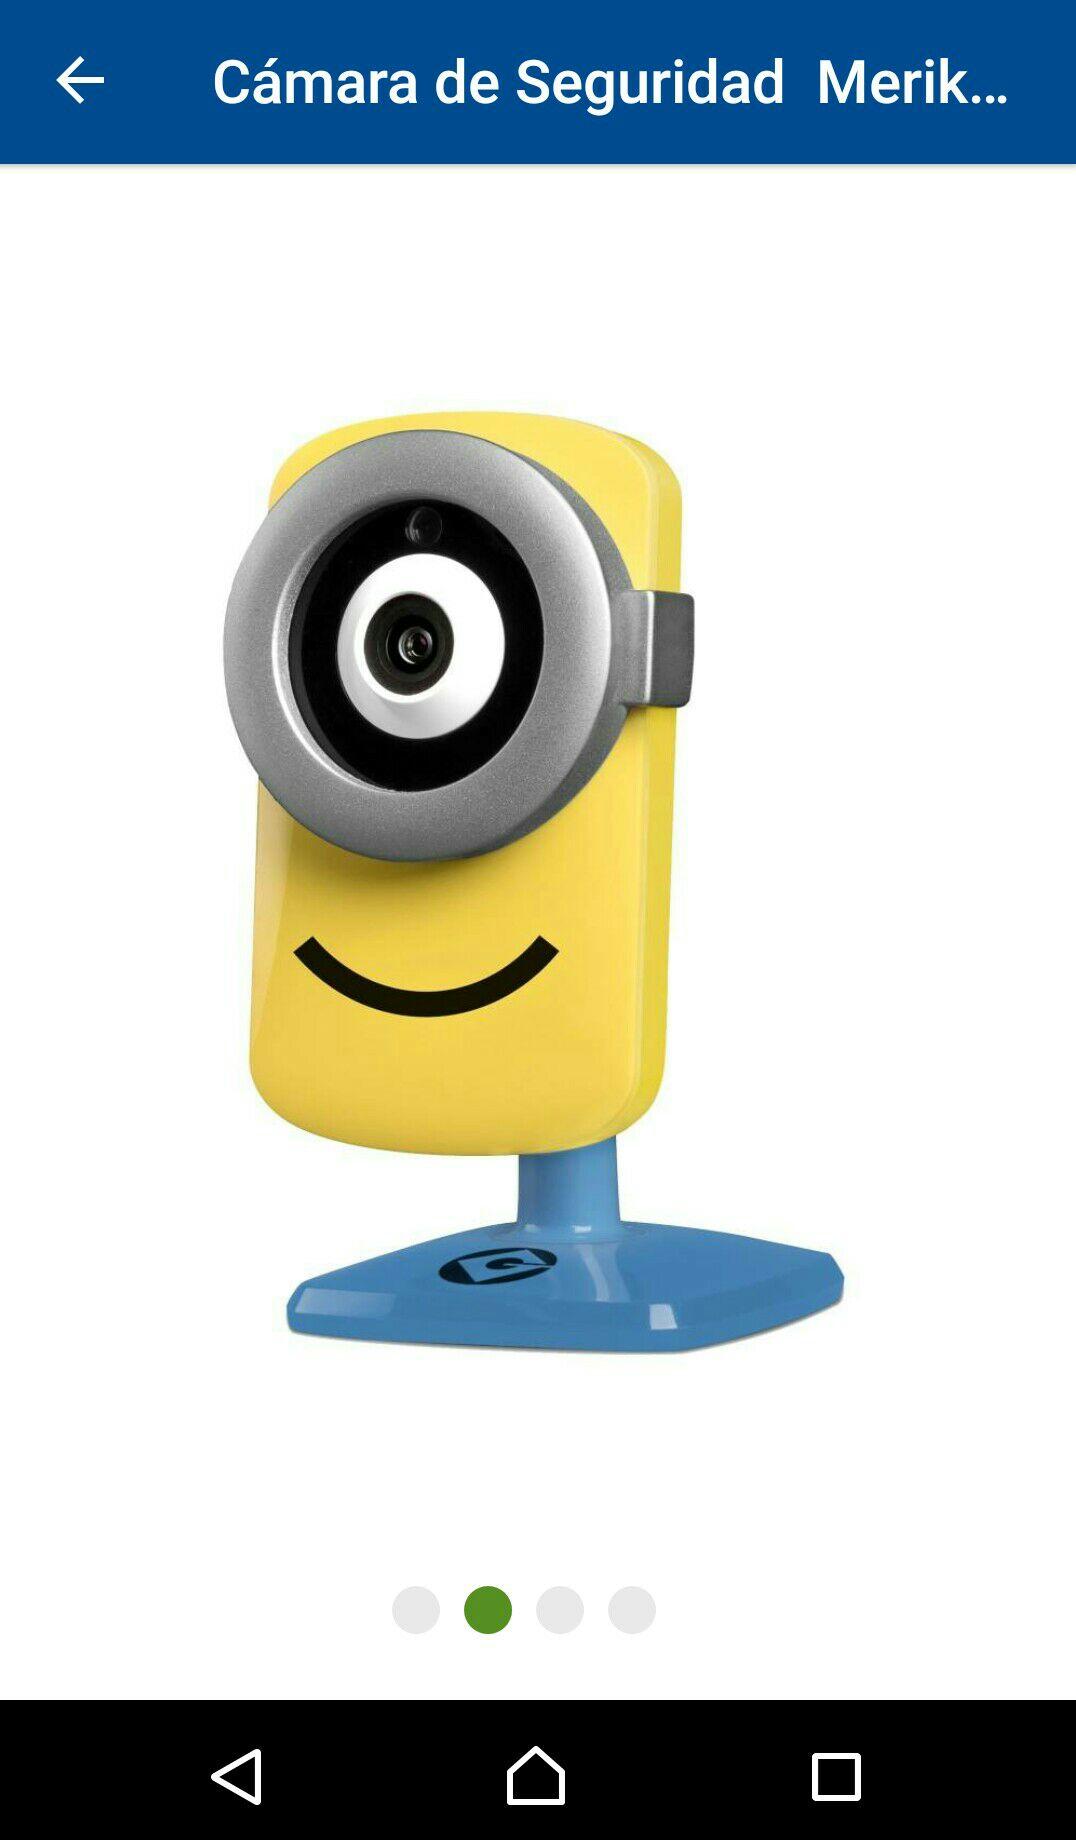 Sams Club Online: Cámara de Seguridad Merik Tend Minion con Wi-fi HD